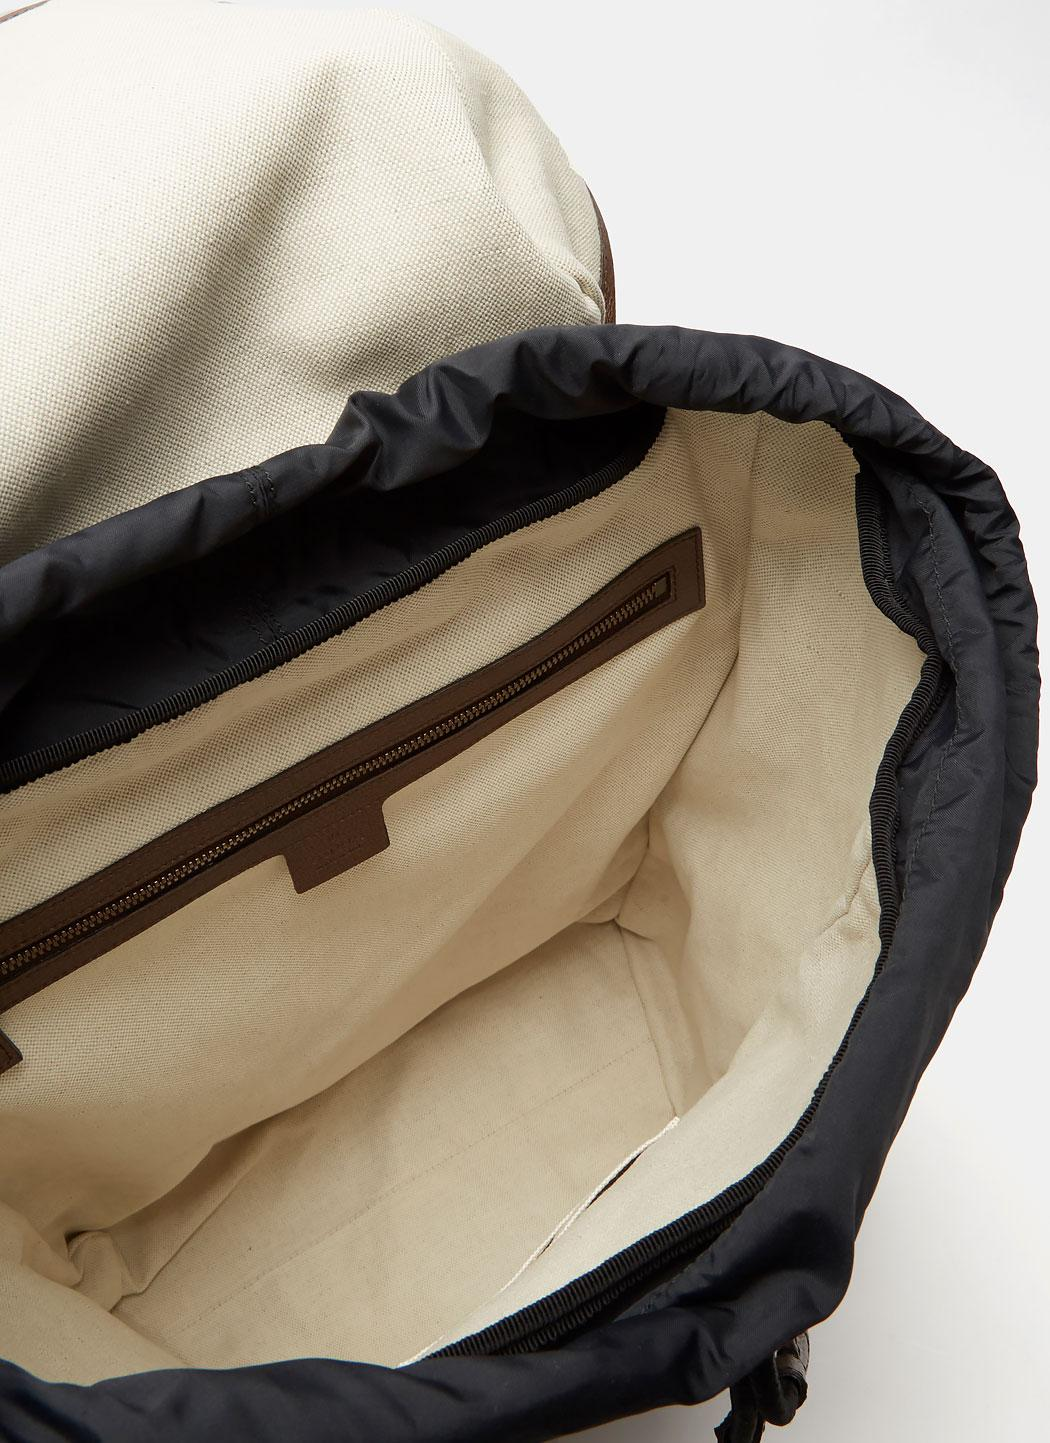 da11f39ceec9 Gucci Neo Vintage Backpack- Fenix Toulouse Handball